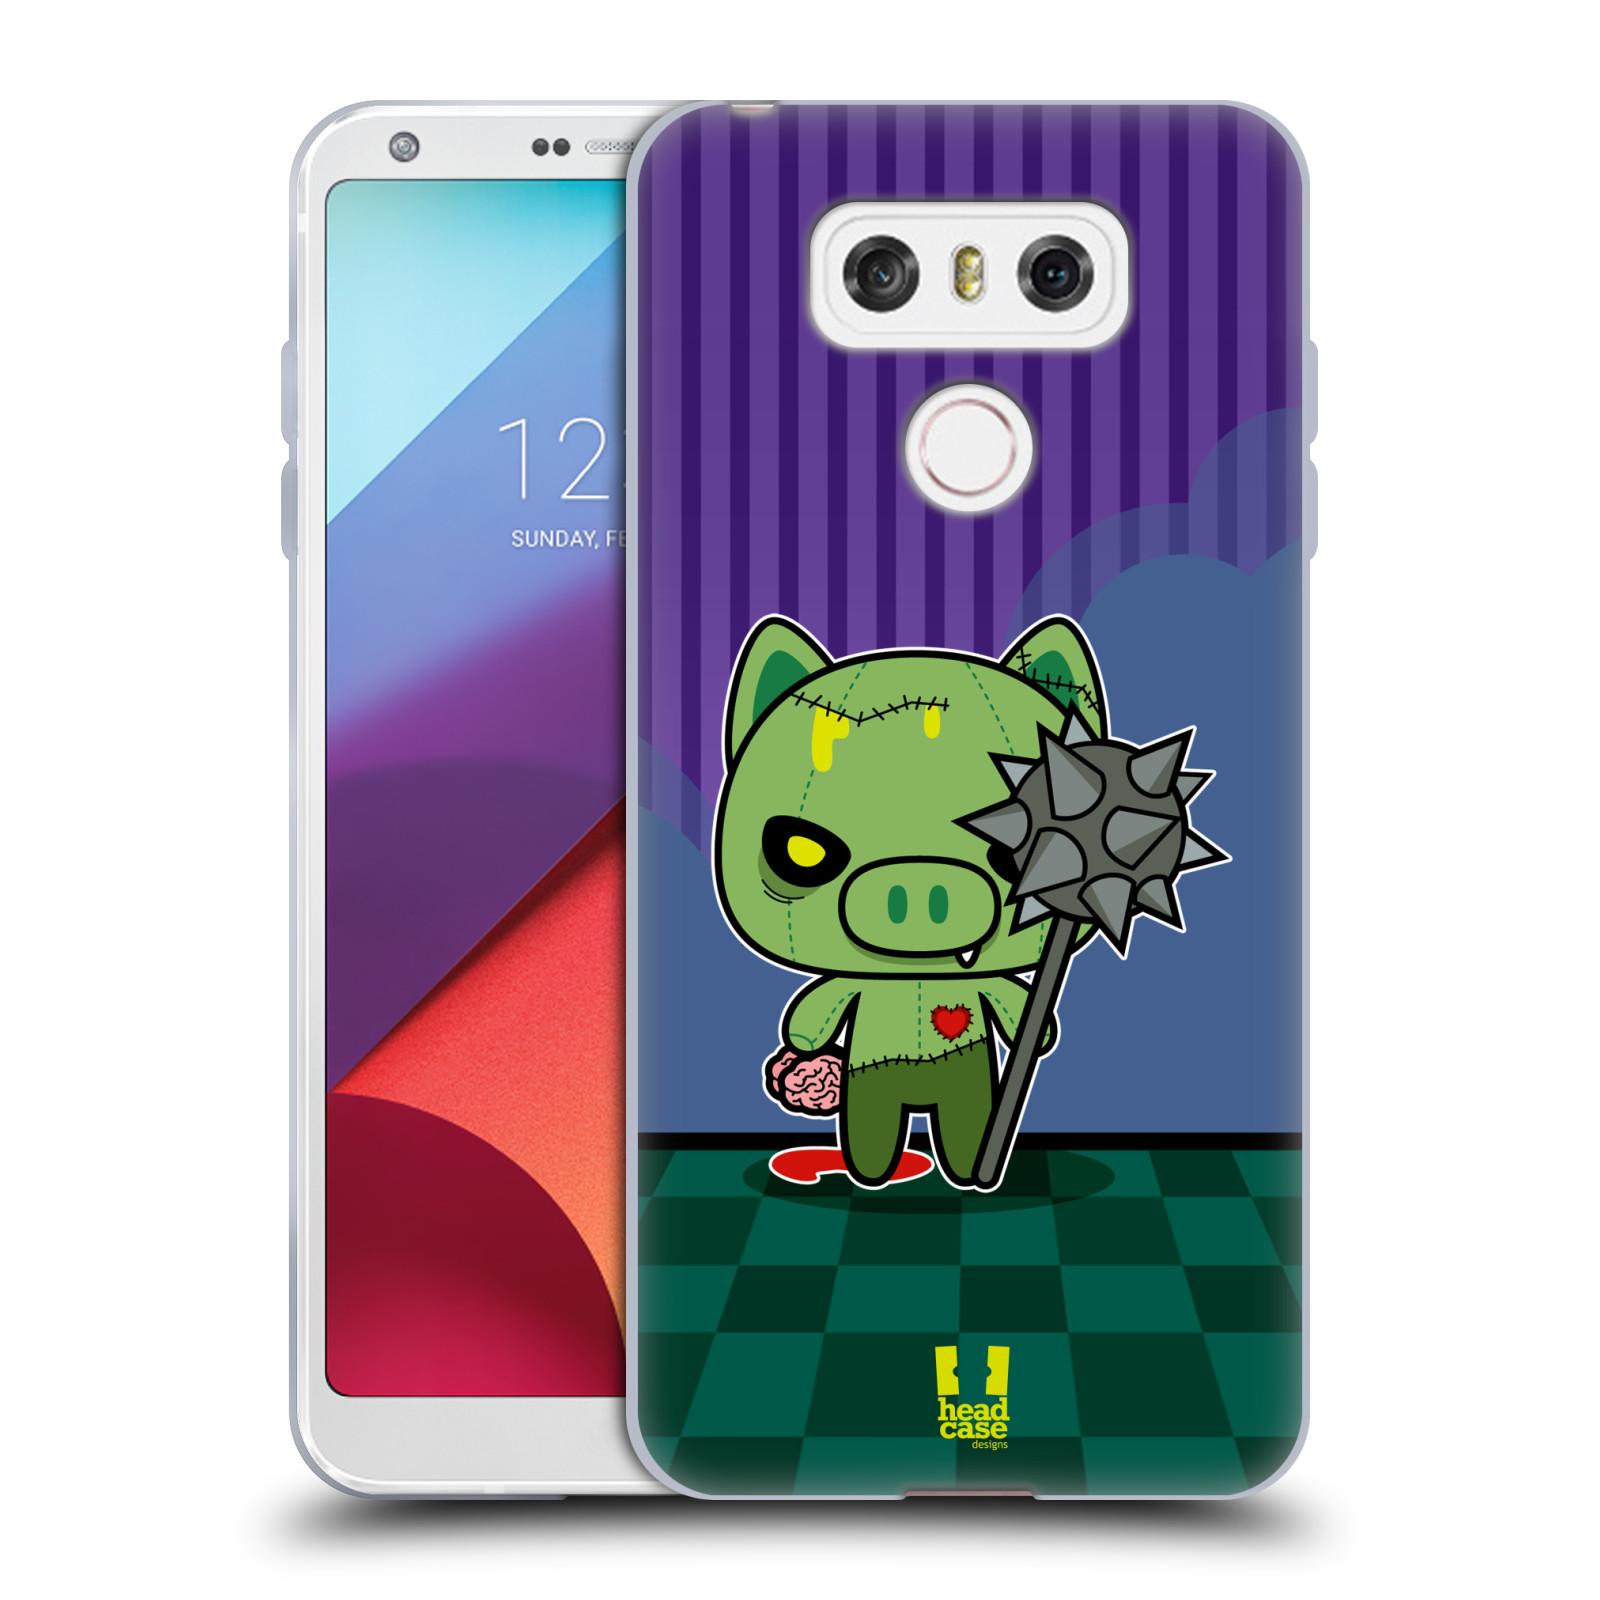 Silikonové pouzdro na mobil LG G6 - Head Case ZOMBIE PAŠÍK (Silikonový kryt či obal na mobilní telefon LG G6 H870 / LG G6 Dual SIM H870DS)